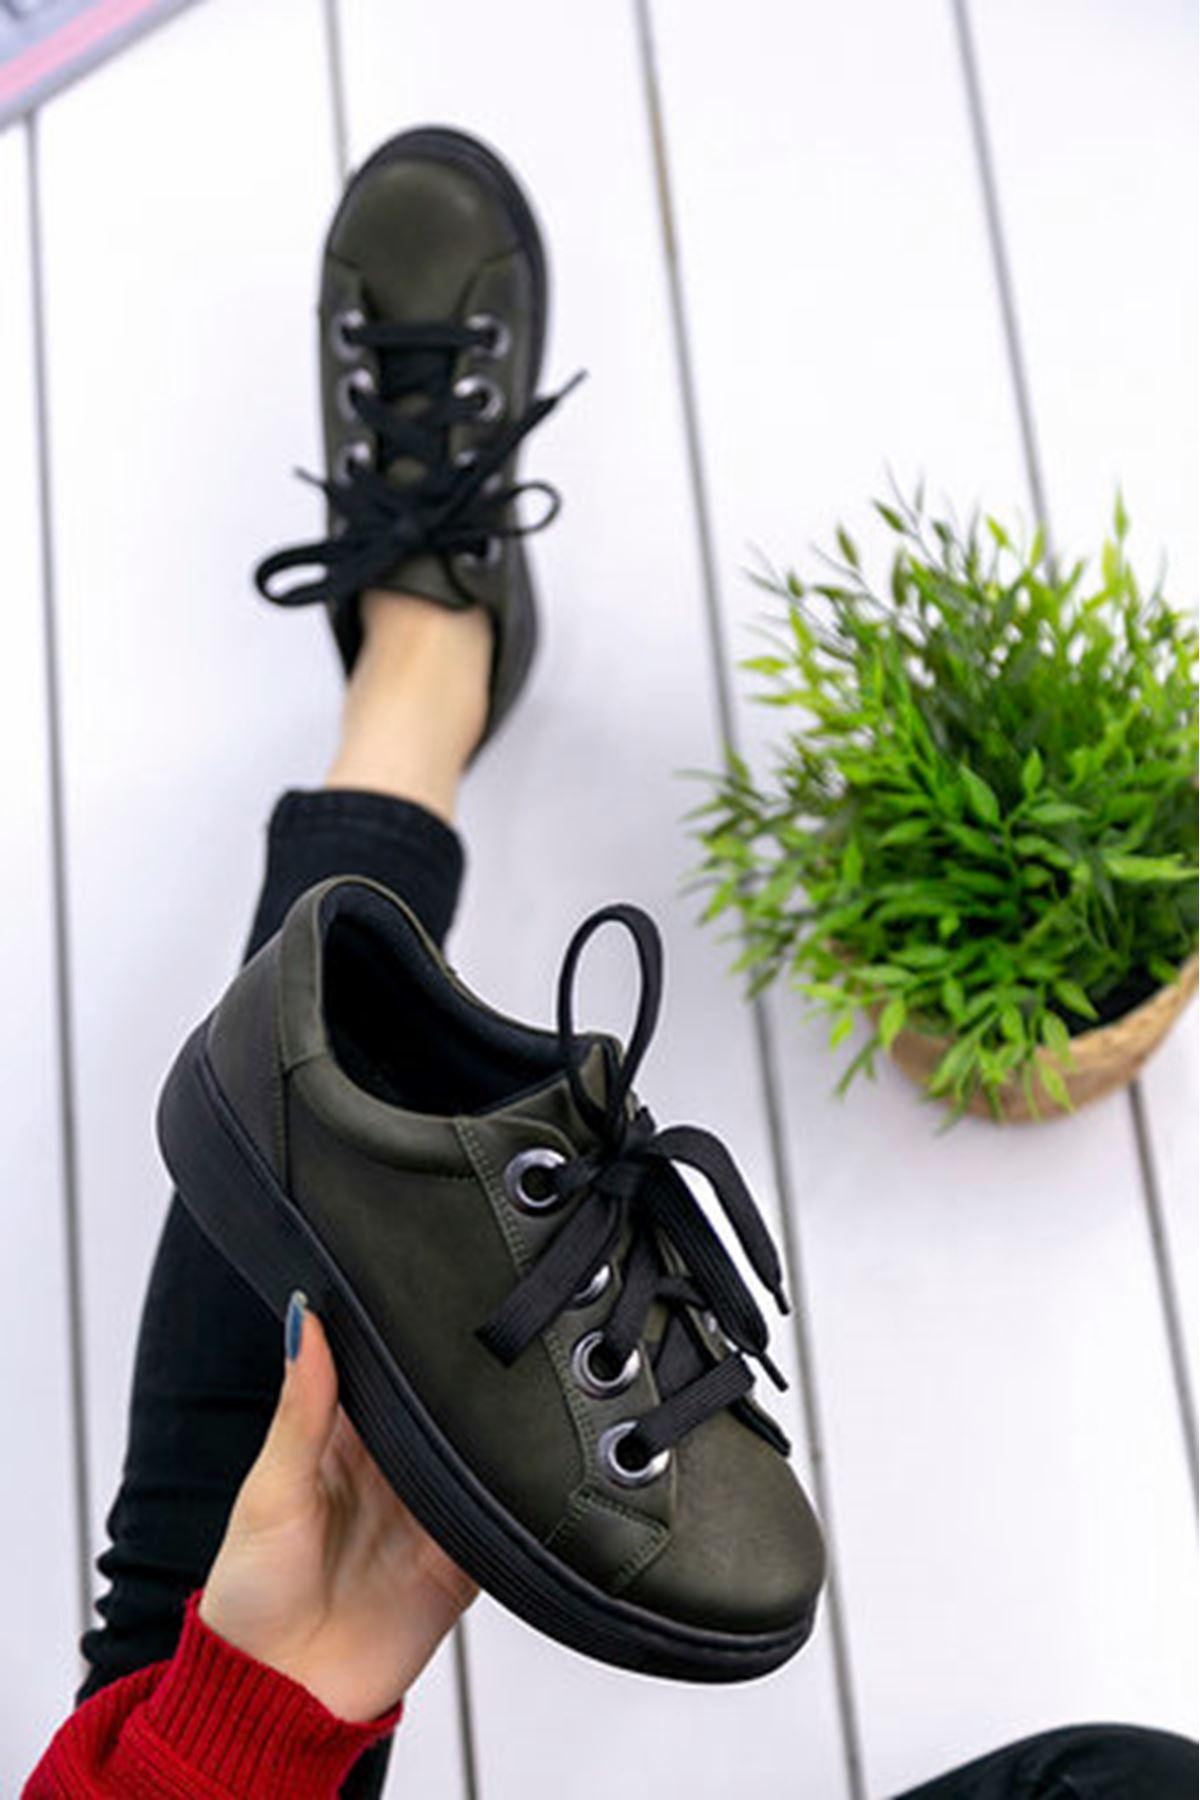 Celso Mat Deri Kalın Bağcık Detay Sneakers Haki